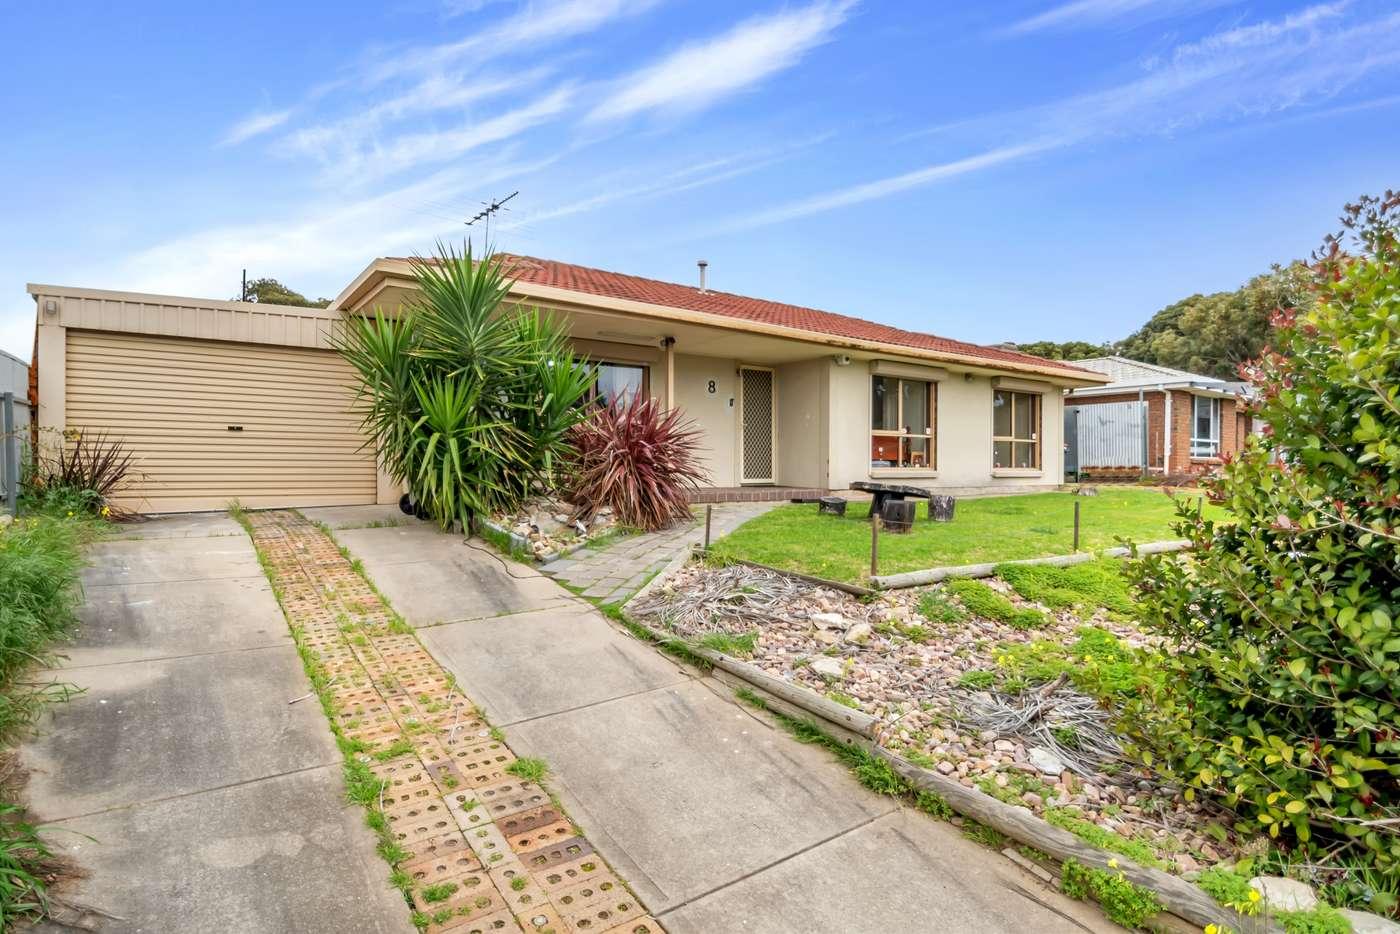 Main view of Homely house listing, 8 Claremont Street, Morphett Vale SA 5162